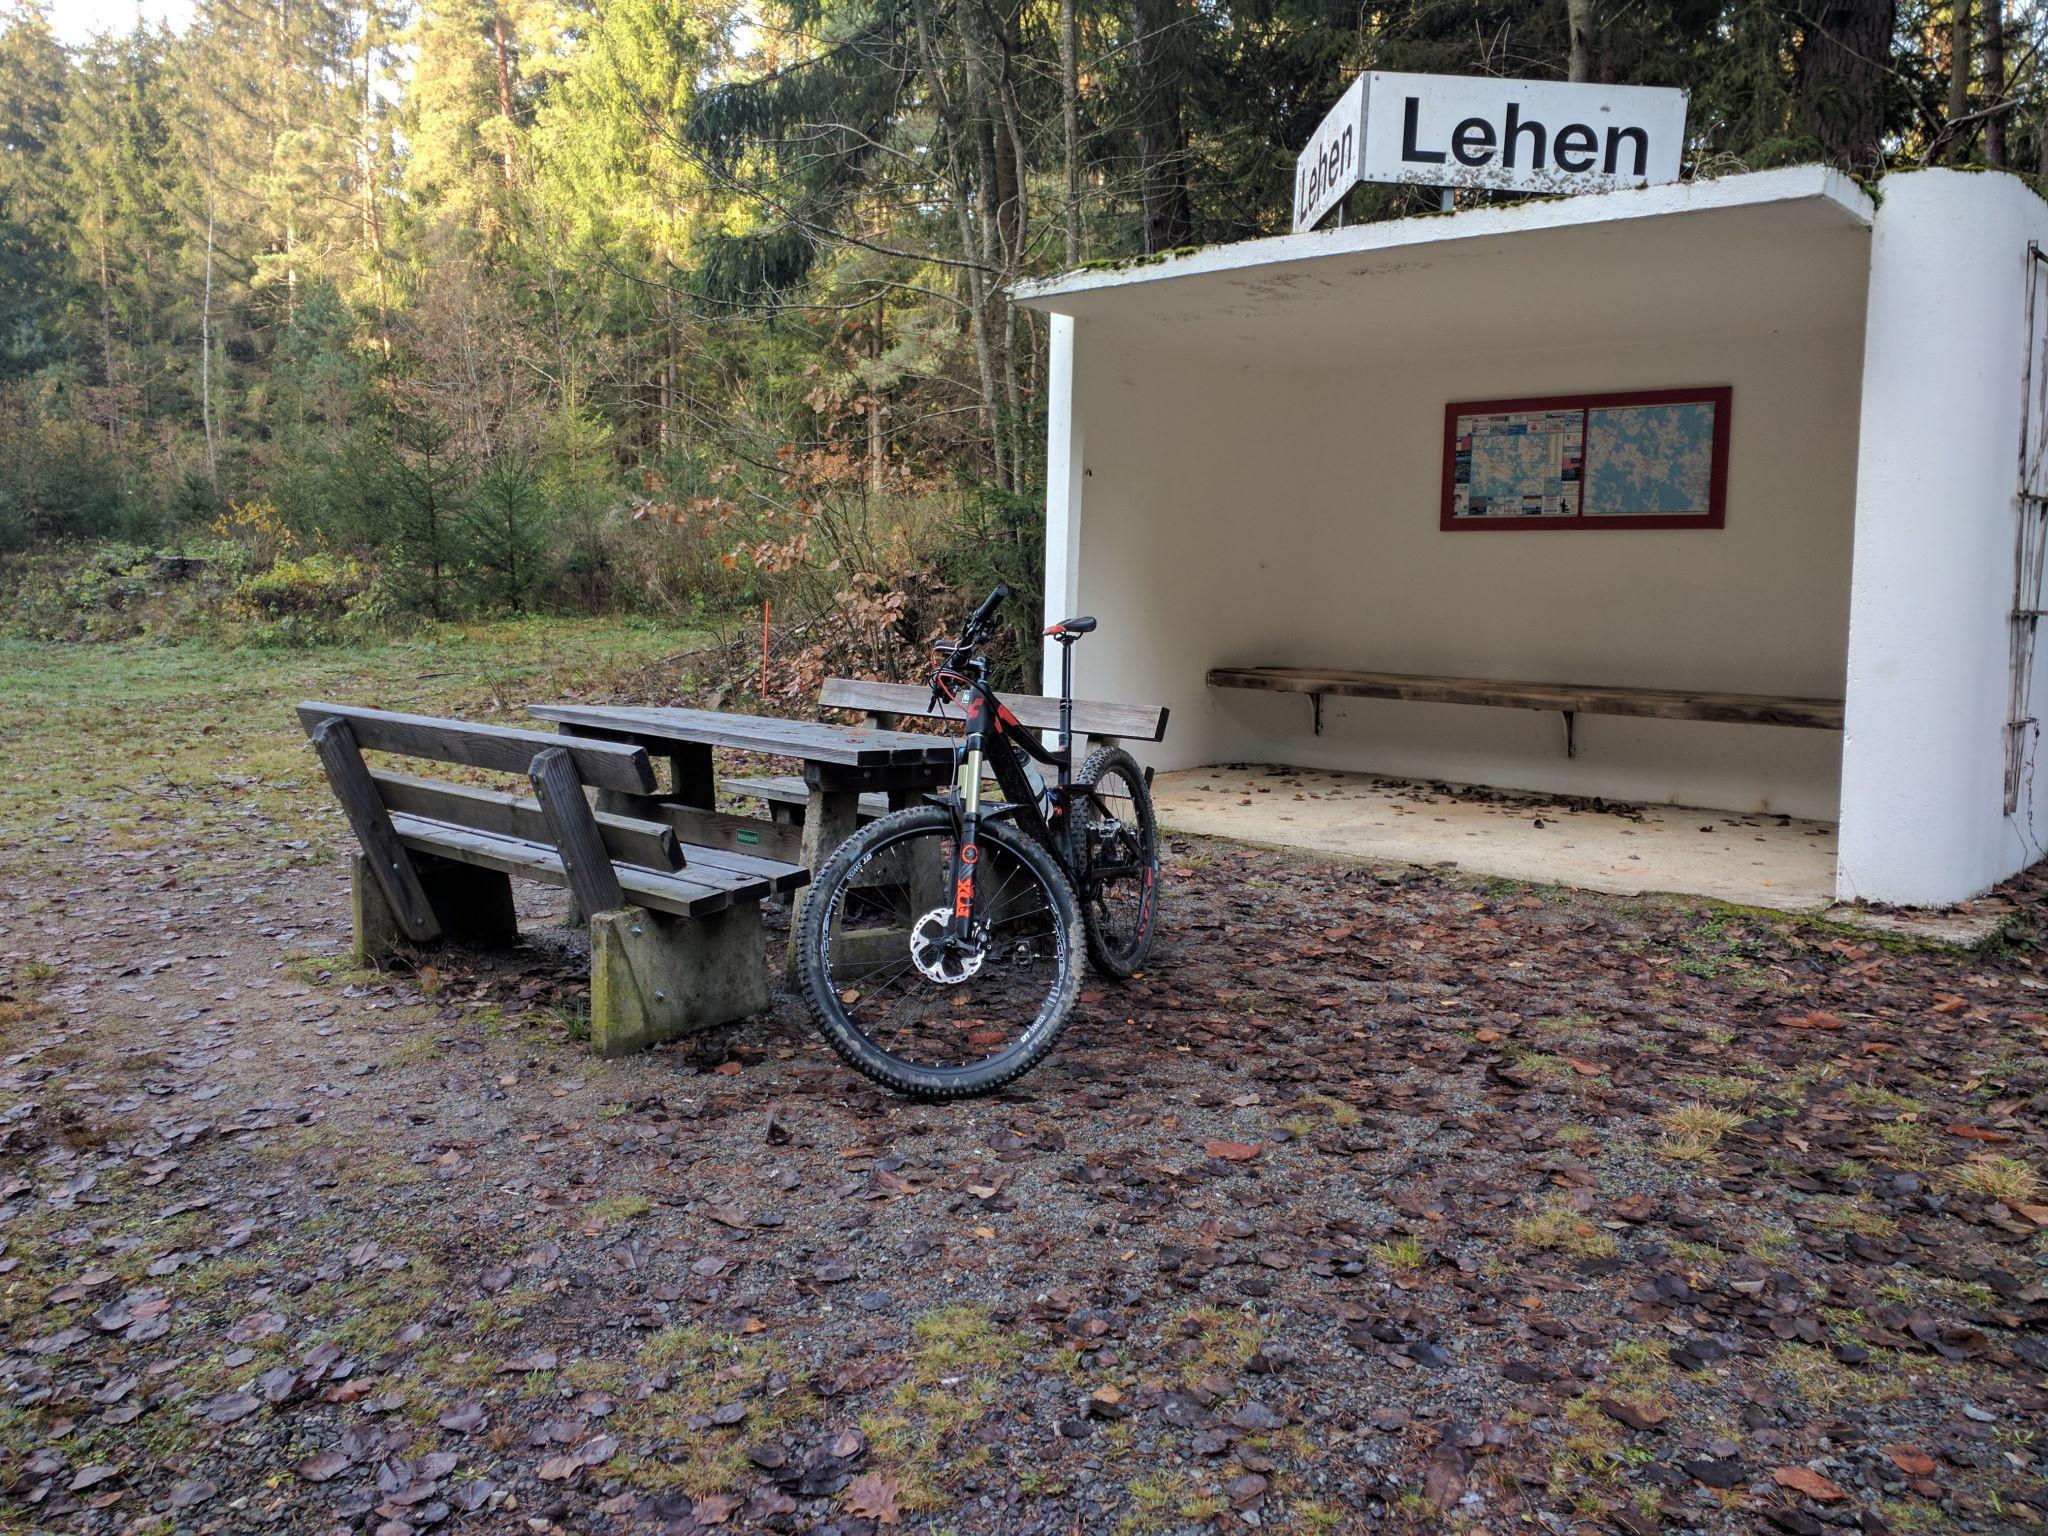 Ehemaliger Bahnhaltepunkt Lehen